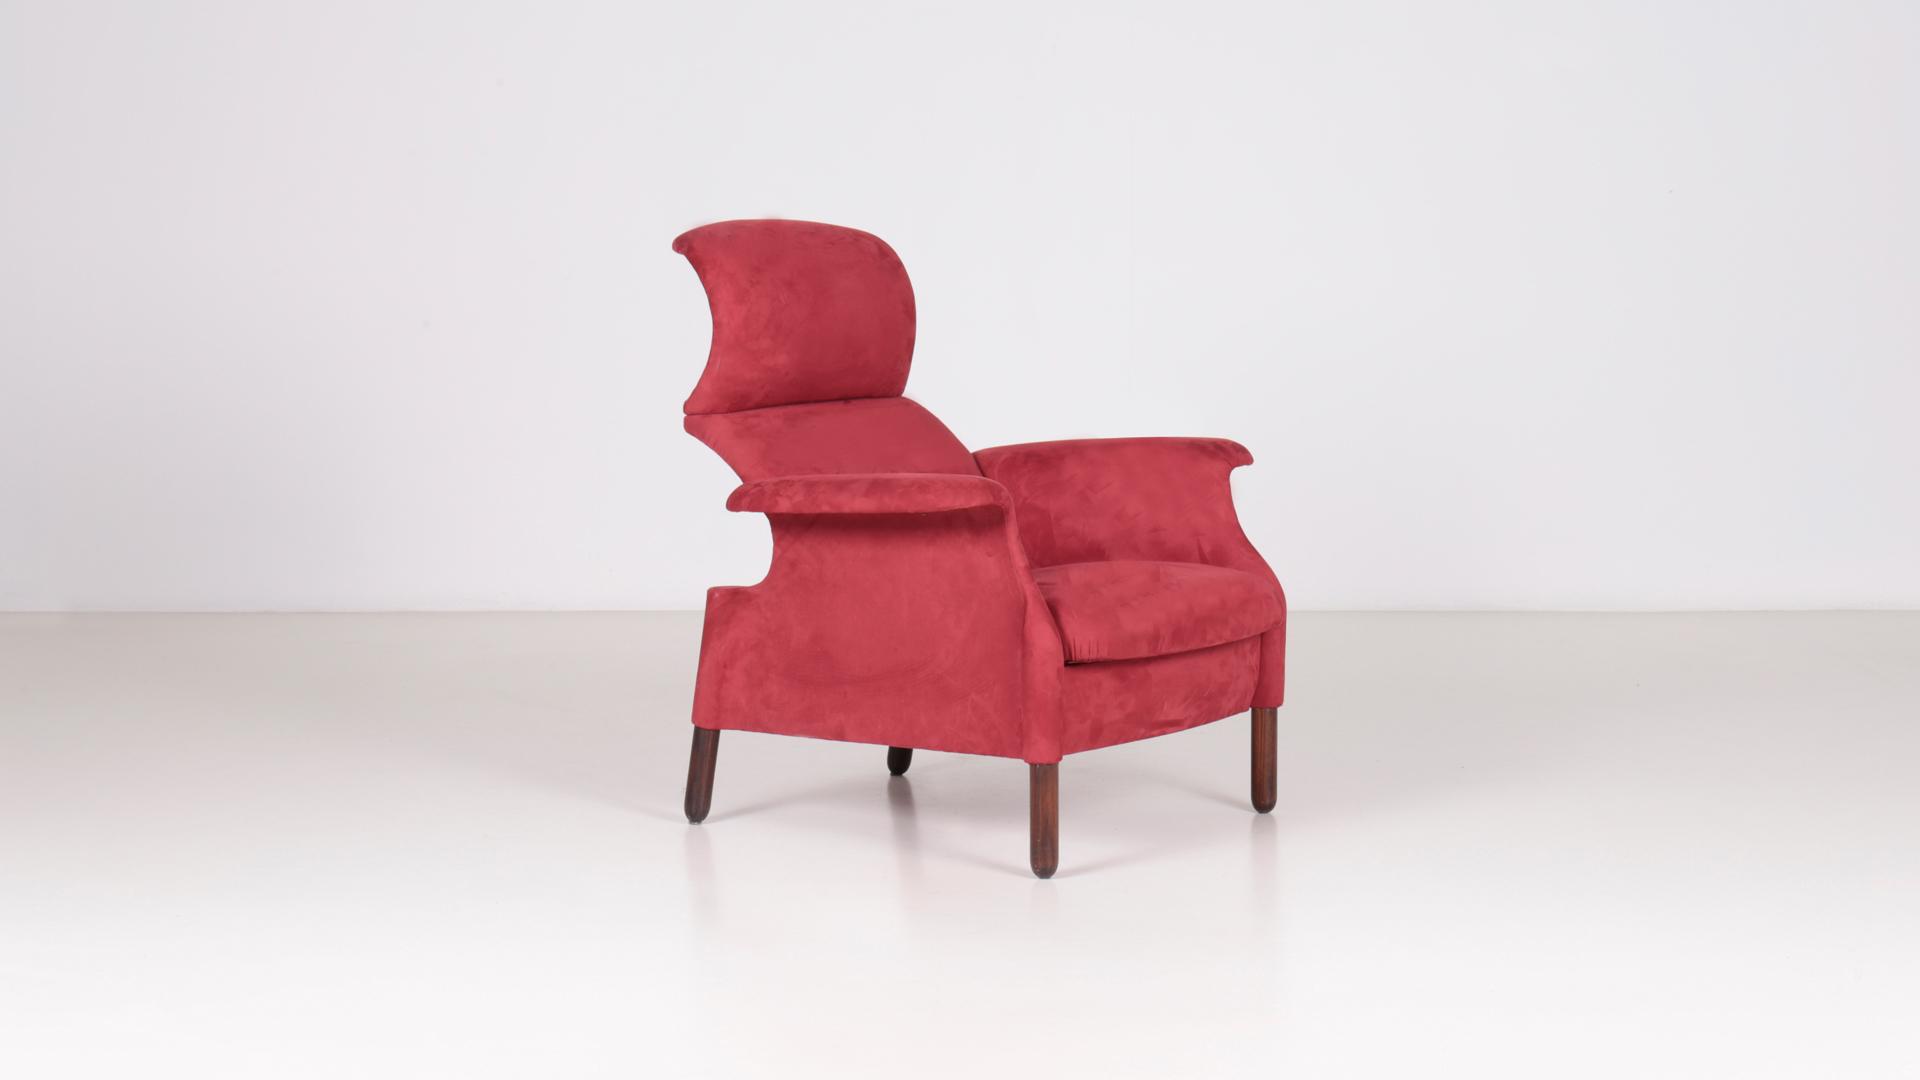 Sanluca armchair by Achille and Pier Giacomo Castiglioni | Paradisoterrestre